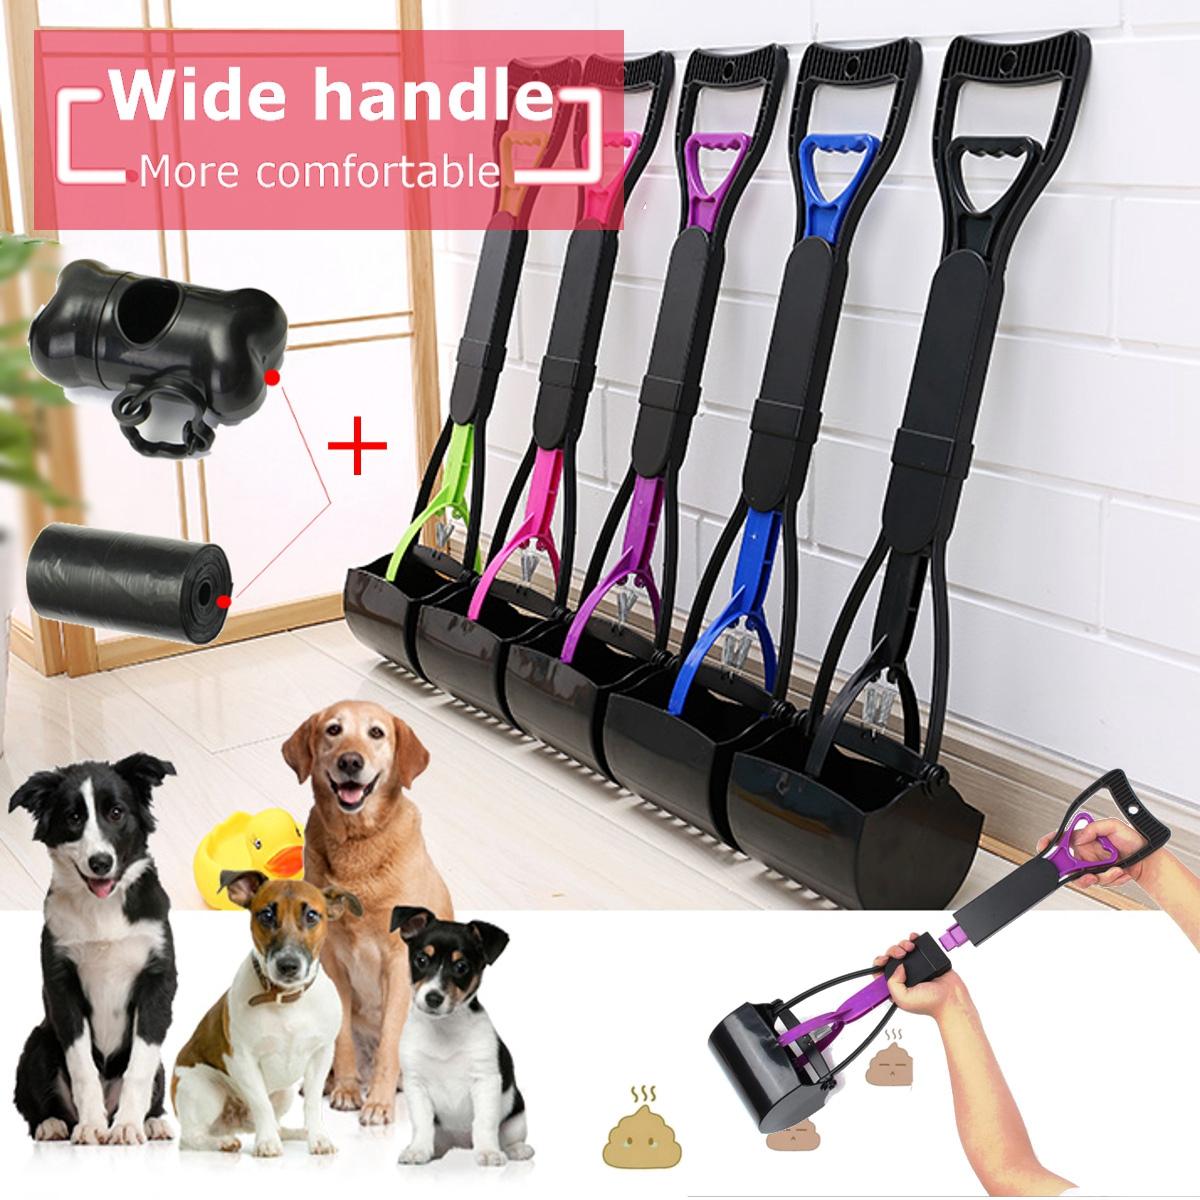 Pet Cat Dog Pooper Scooper Plastic Jaw Poop Scoop Pick Up Pets Easy Clean Waste Shovel Long Handle + Plastic Bag